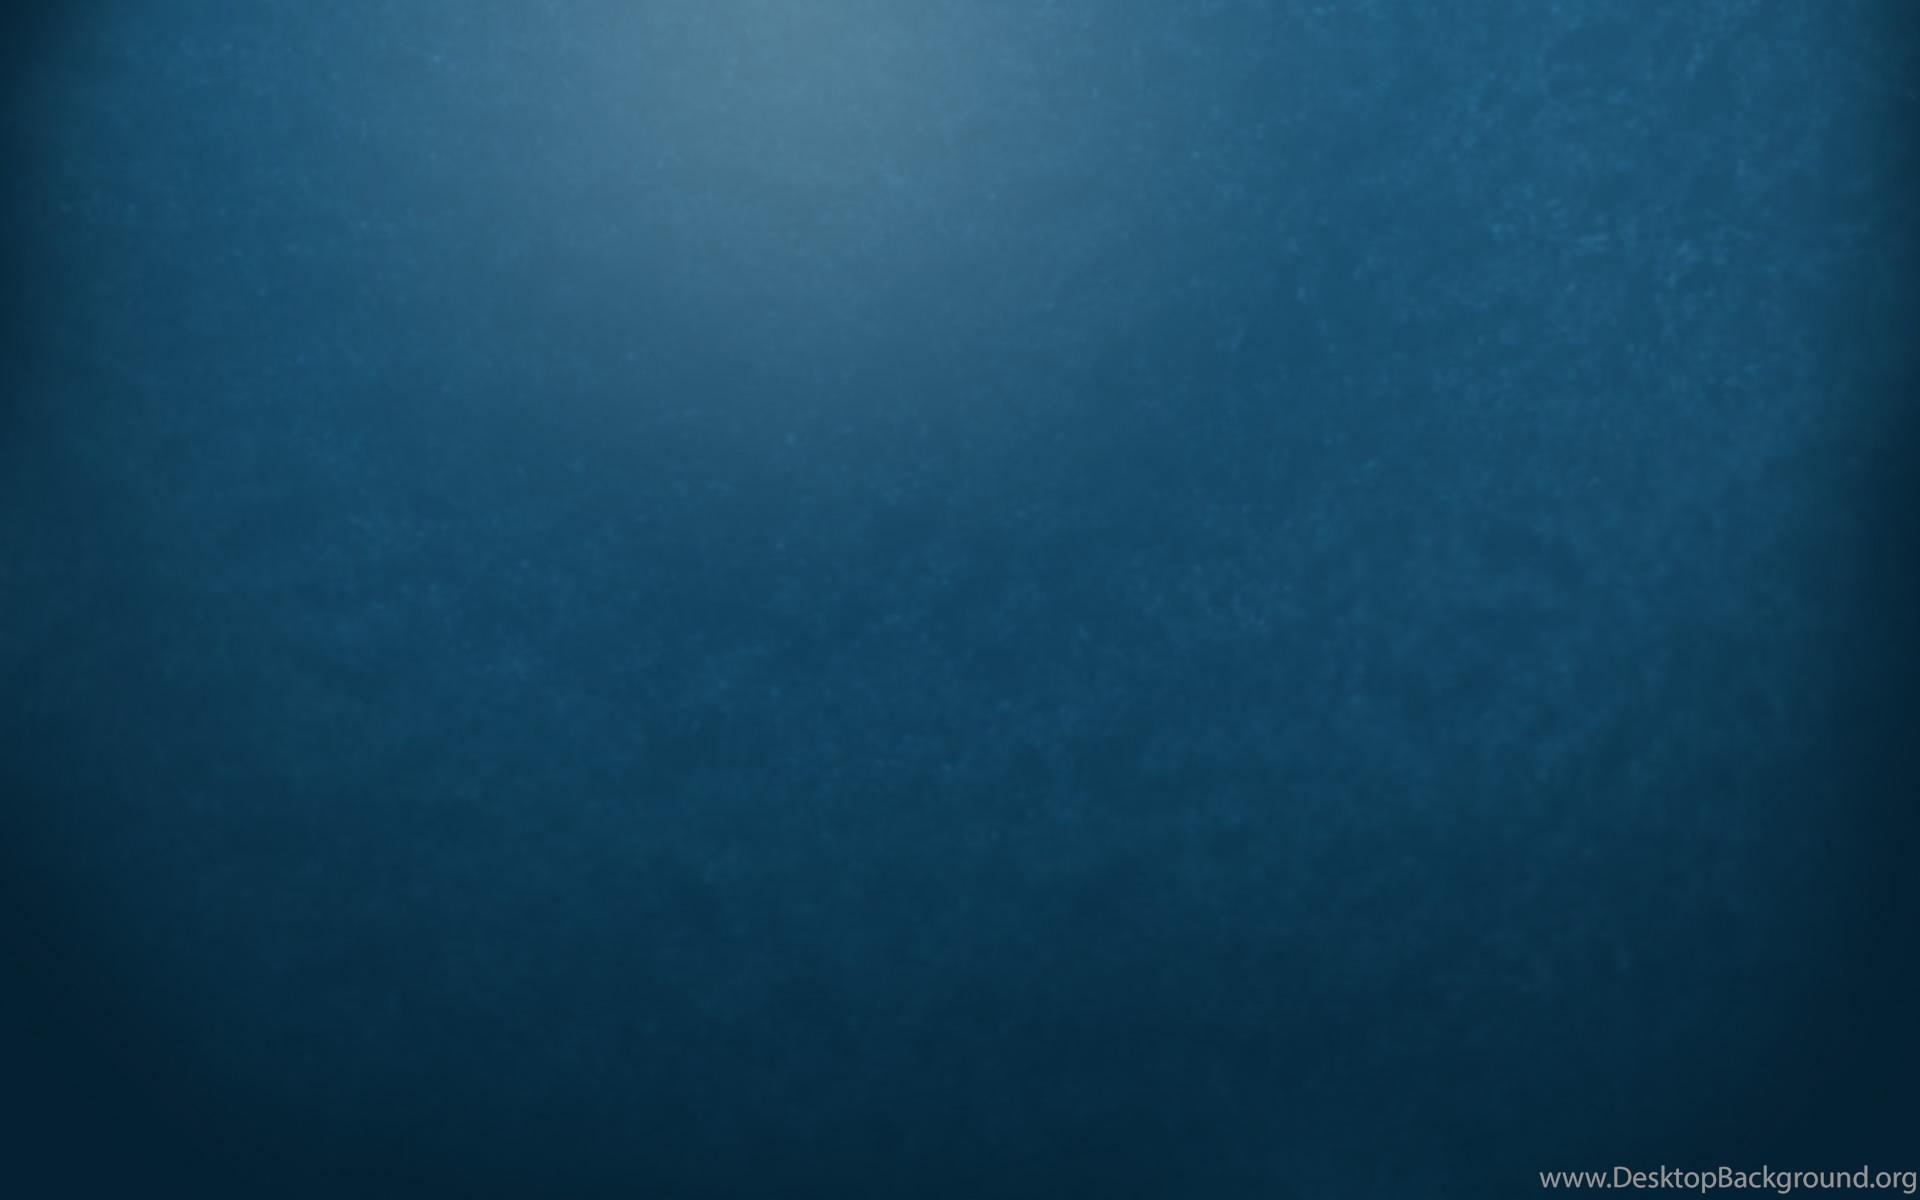 Plain Aqua Backgrounds